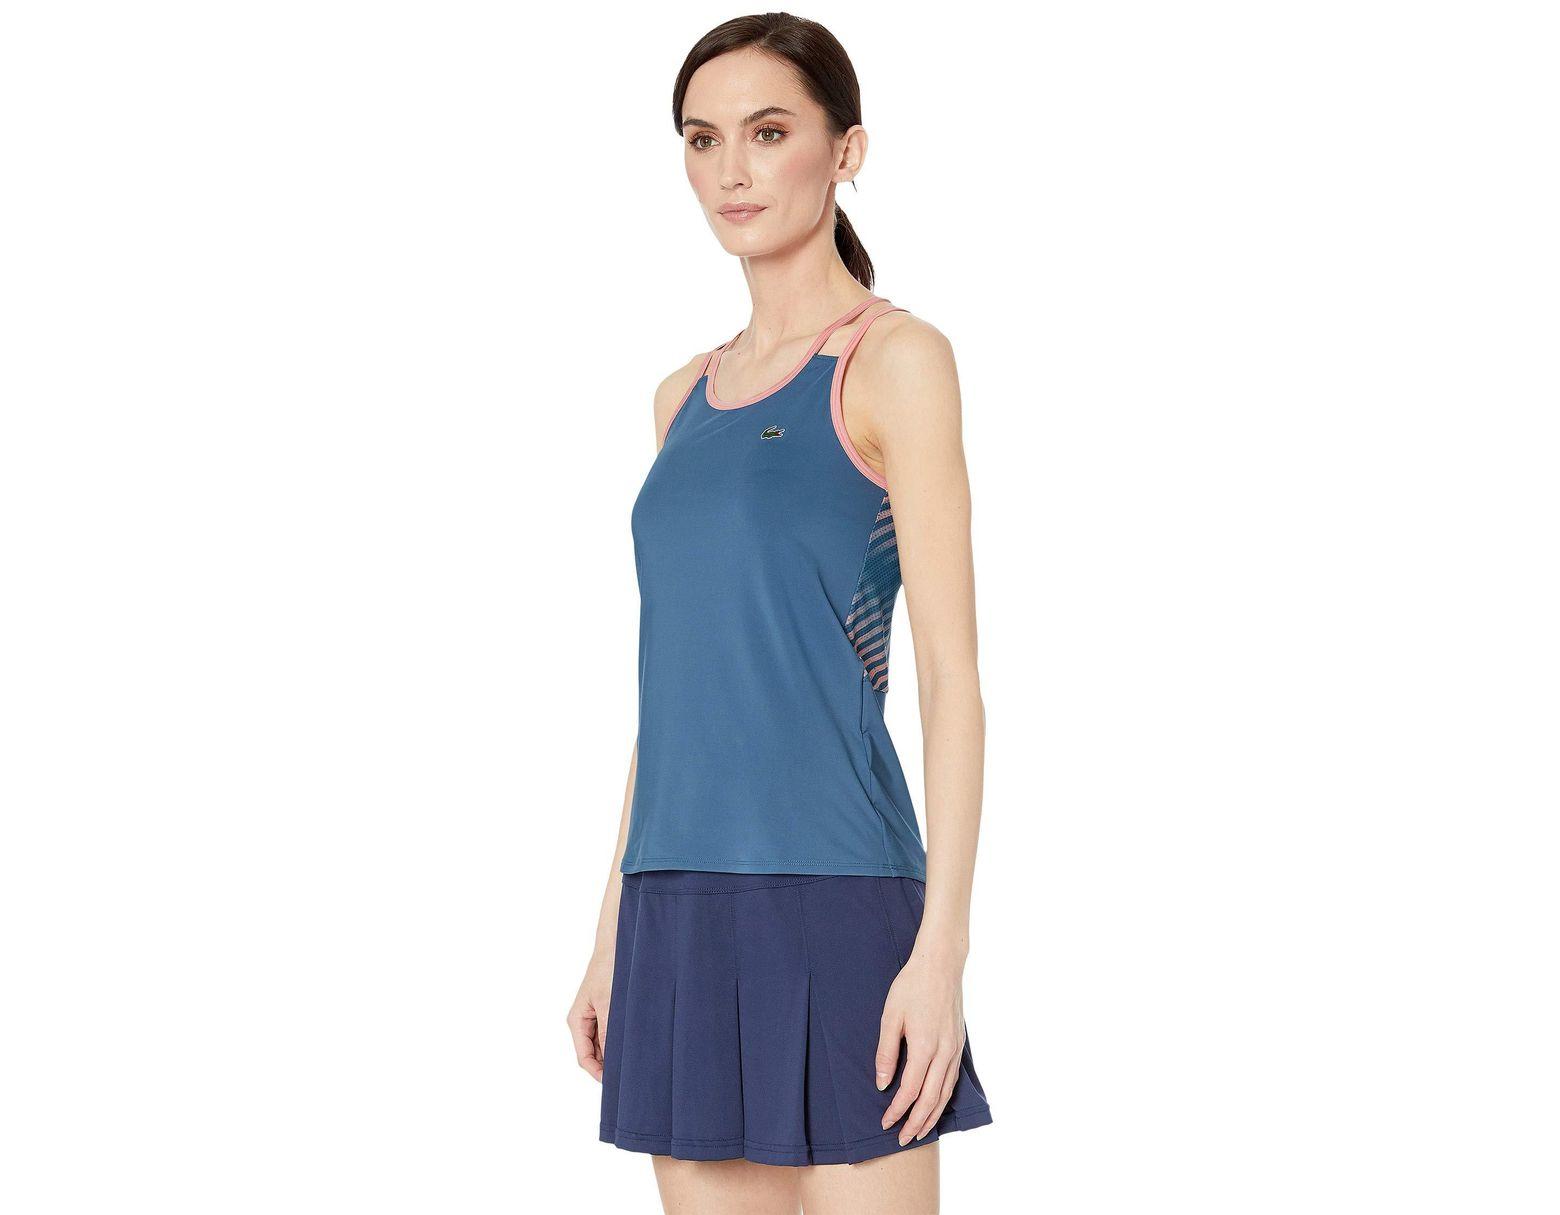 3f23ad6e98 Women's Blue Stretch Technical Jersey Tennis Tank Top